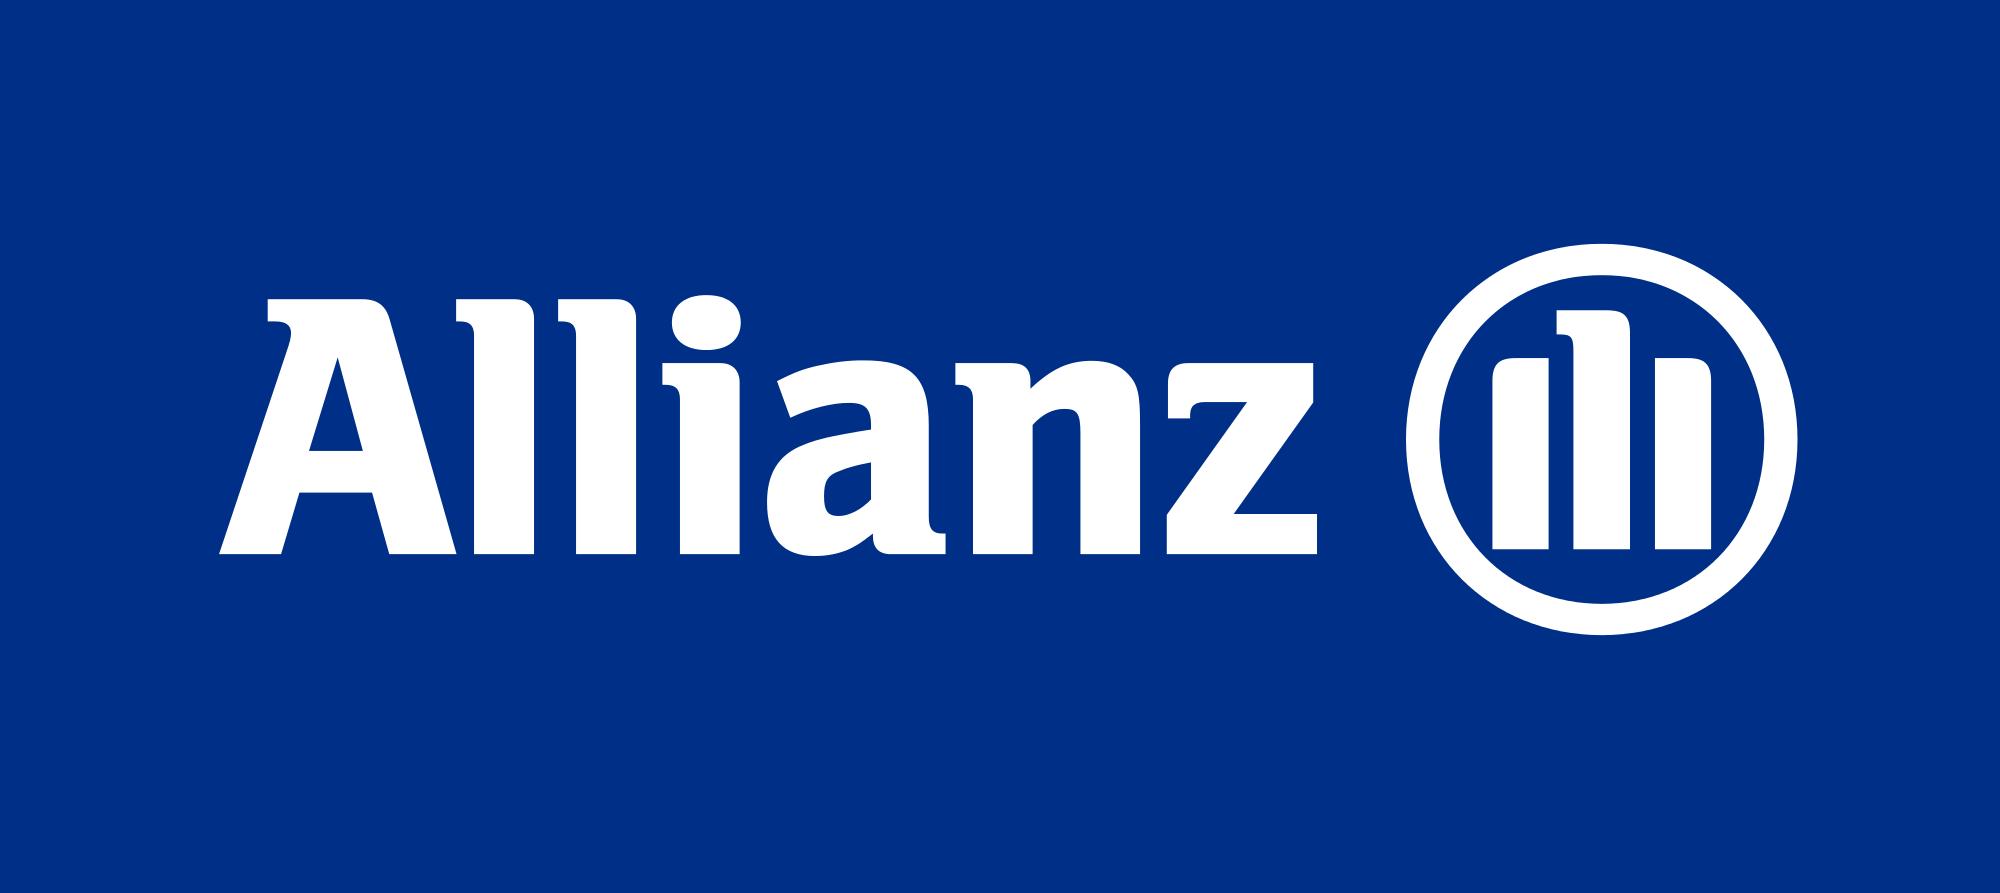 AZ_Allianz_logo